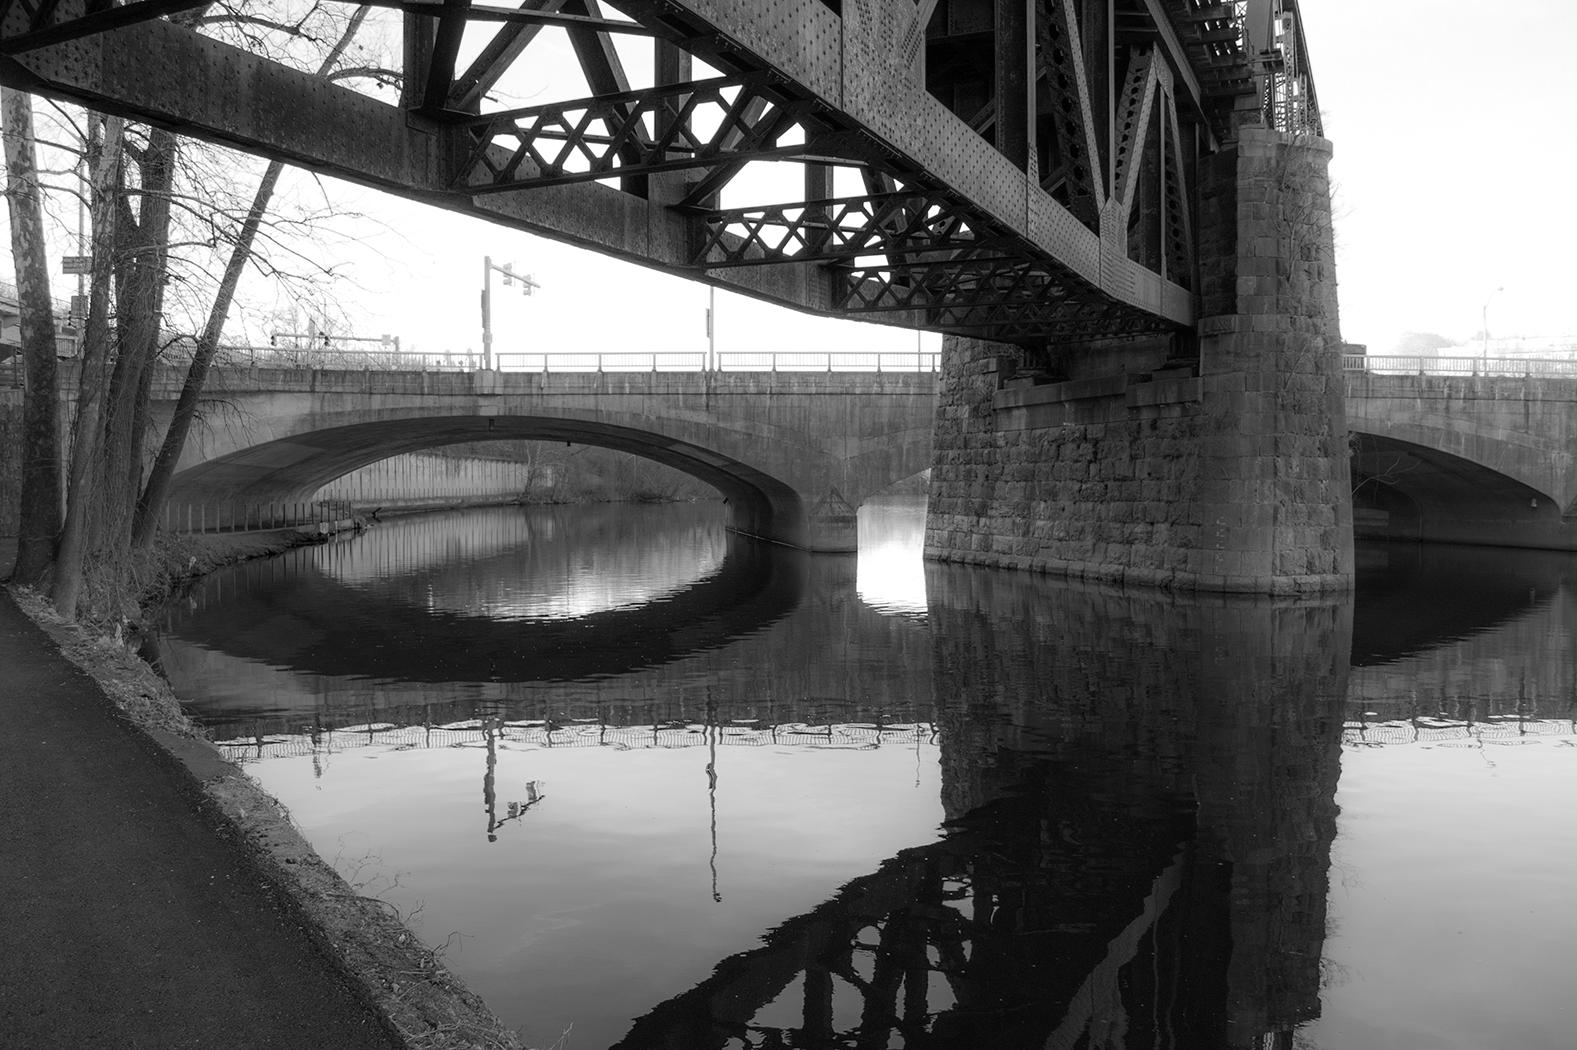 Bridges on the Lehigh